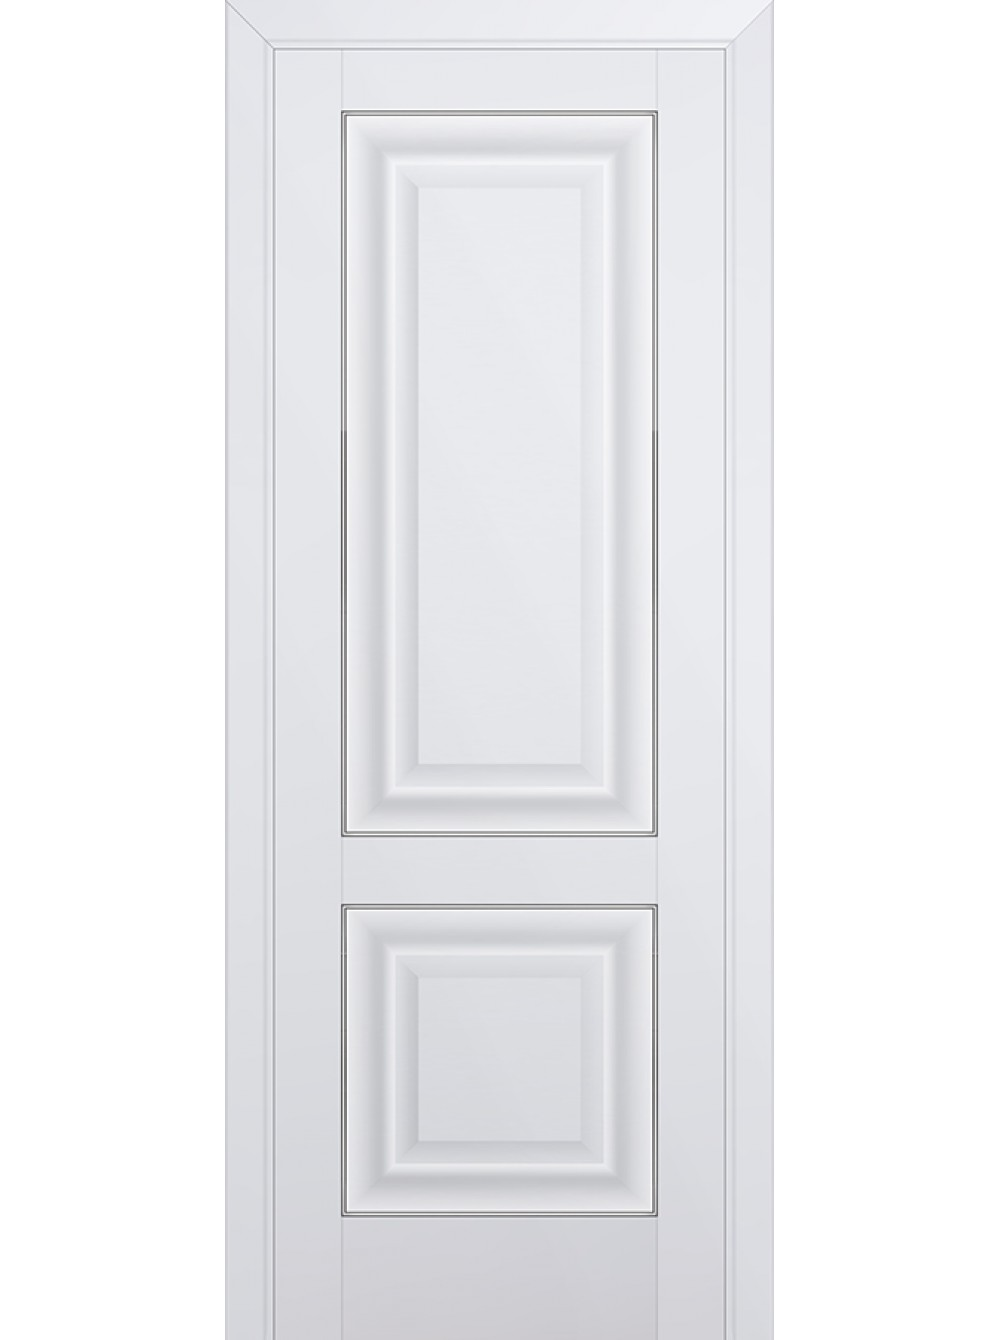 Комплект распашной двери Profildoors 27U (Аляска) 2000х600-800х36 мм (коробка, наличники, добор) фото